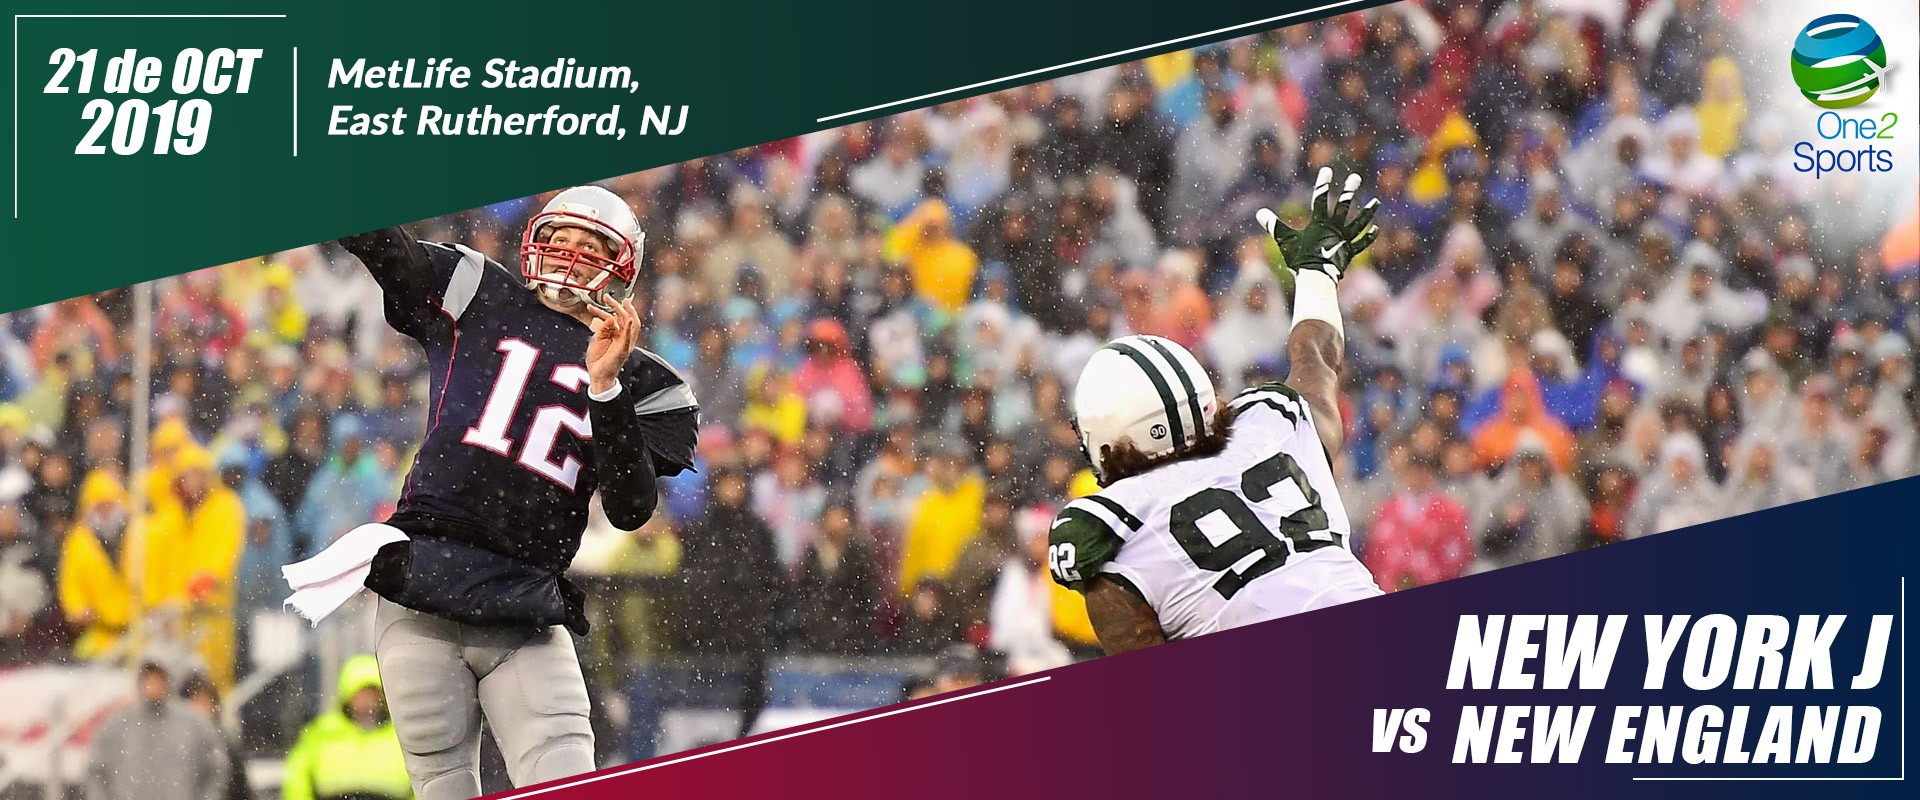 New York J vs New England